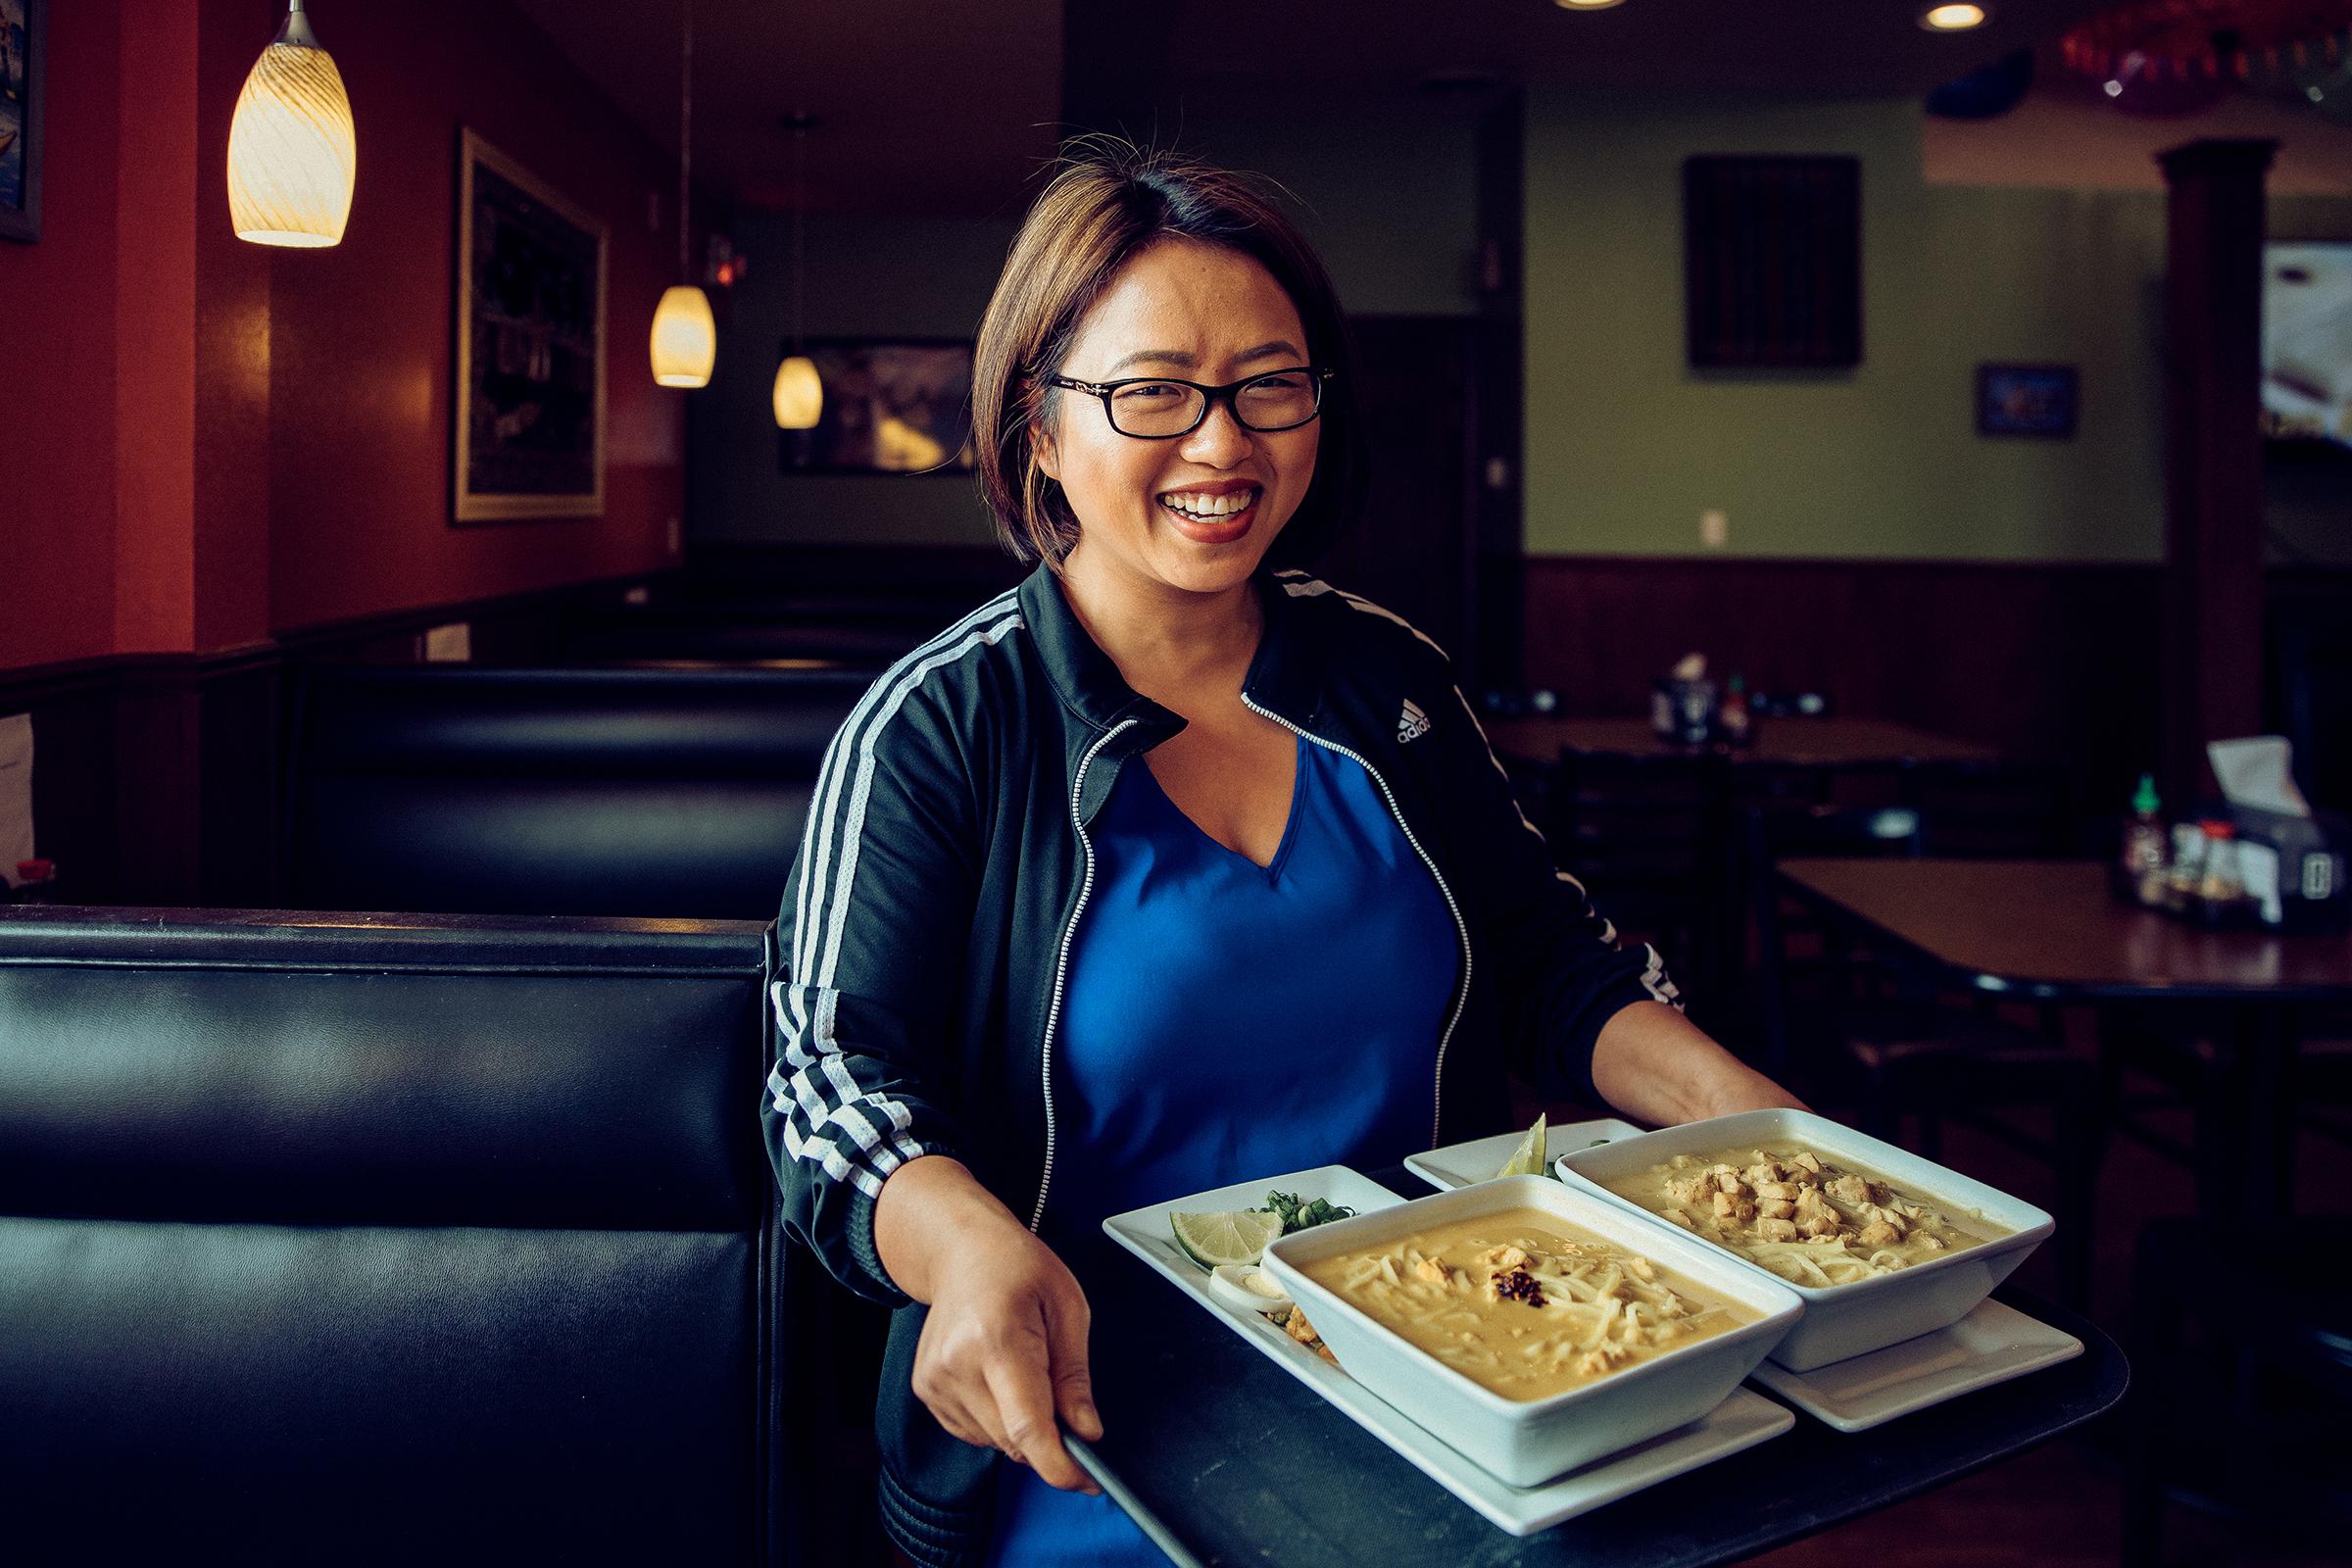 Amanda Sunthang carrying a tray of food inside the Shwe Mandalay Burmese Cuisine restaurant in Battle Creek, Michigan.